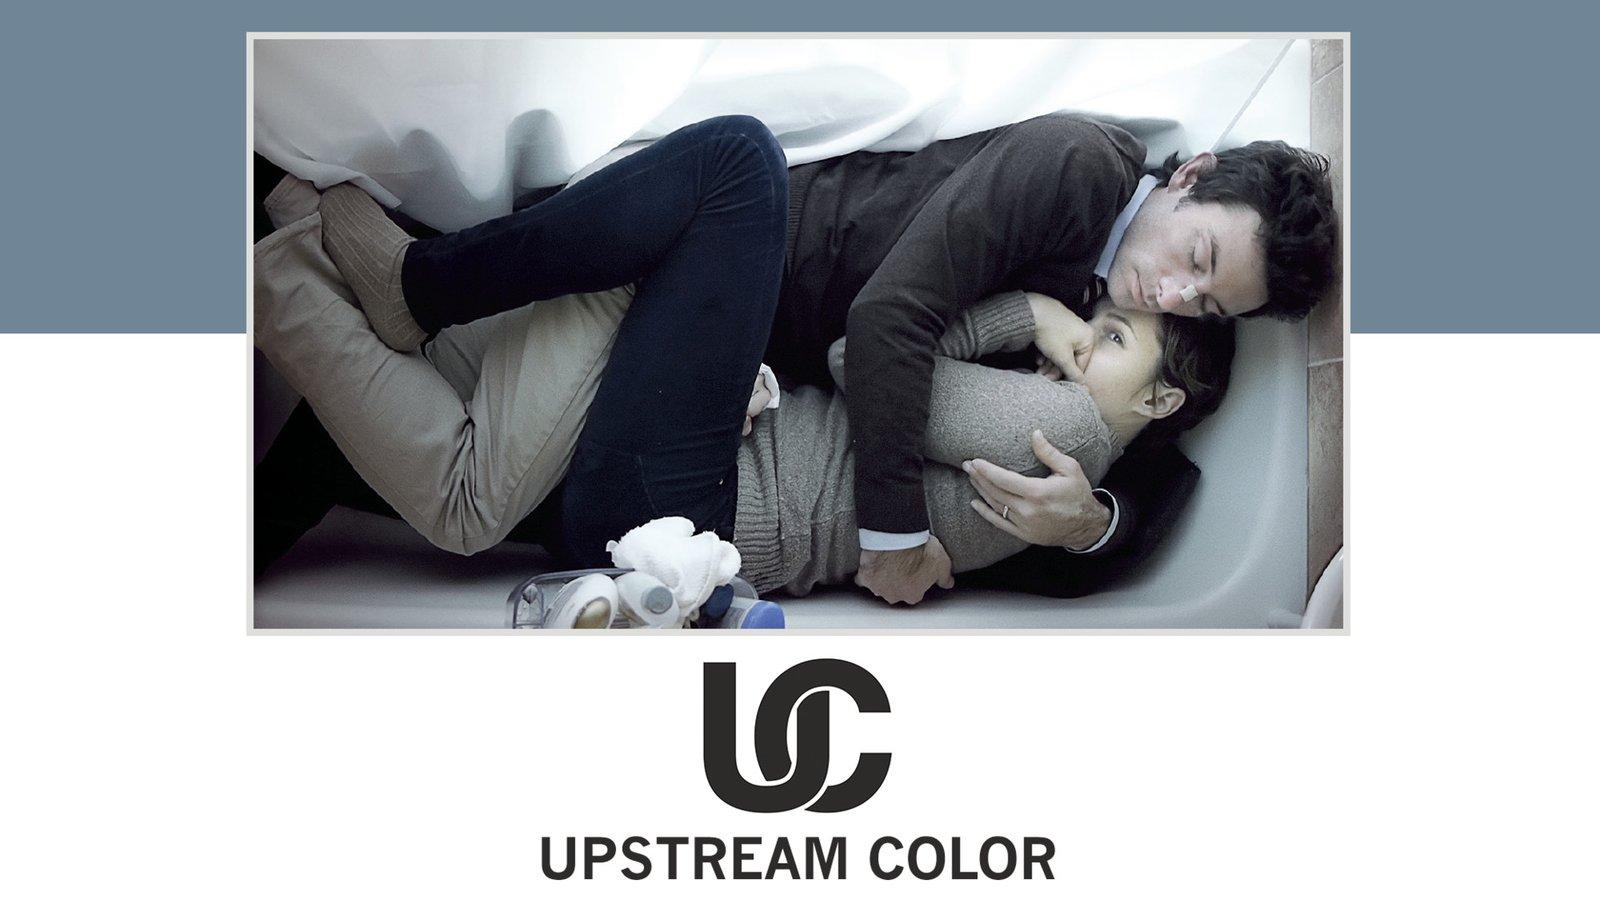 Upstream Color